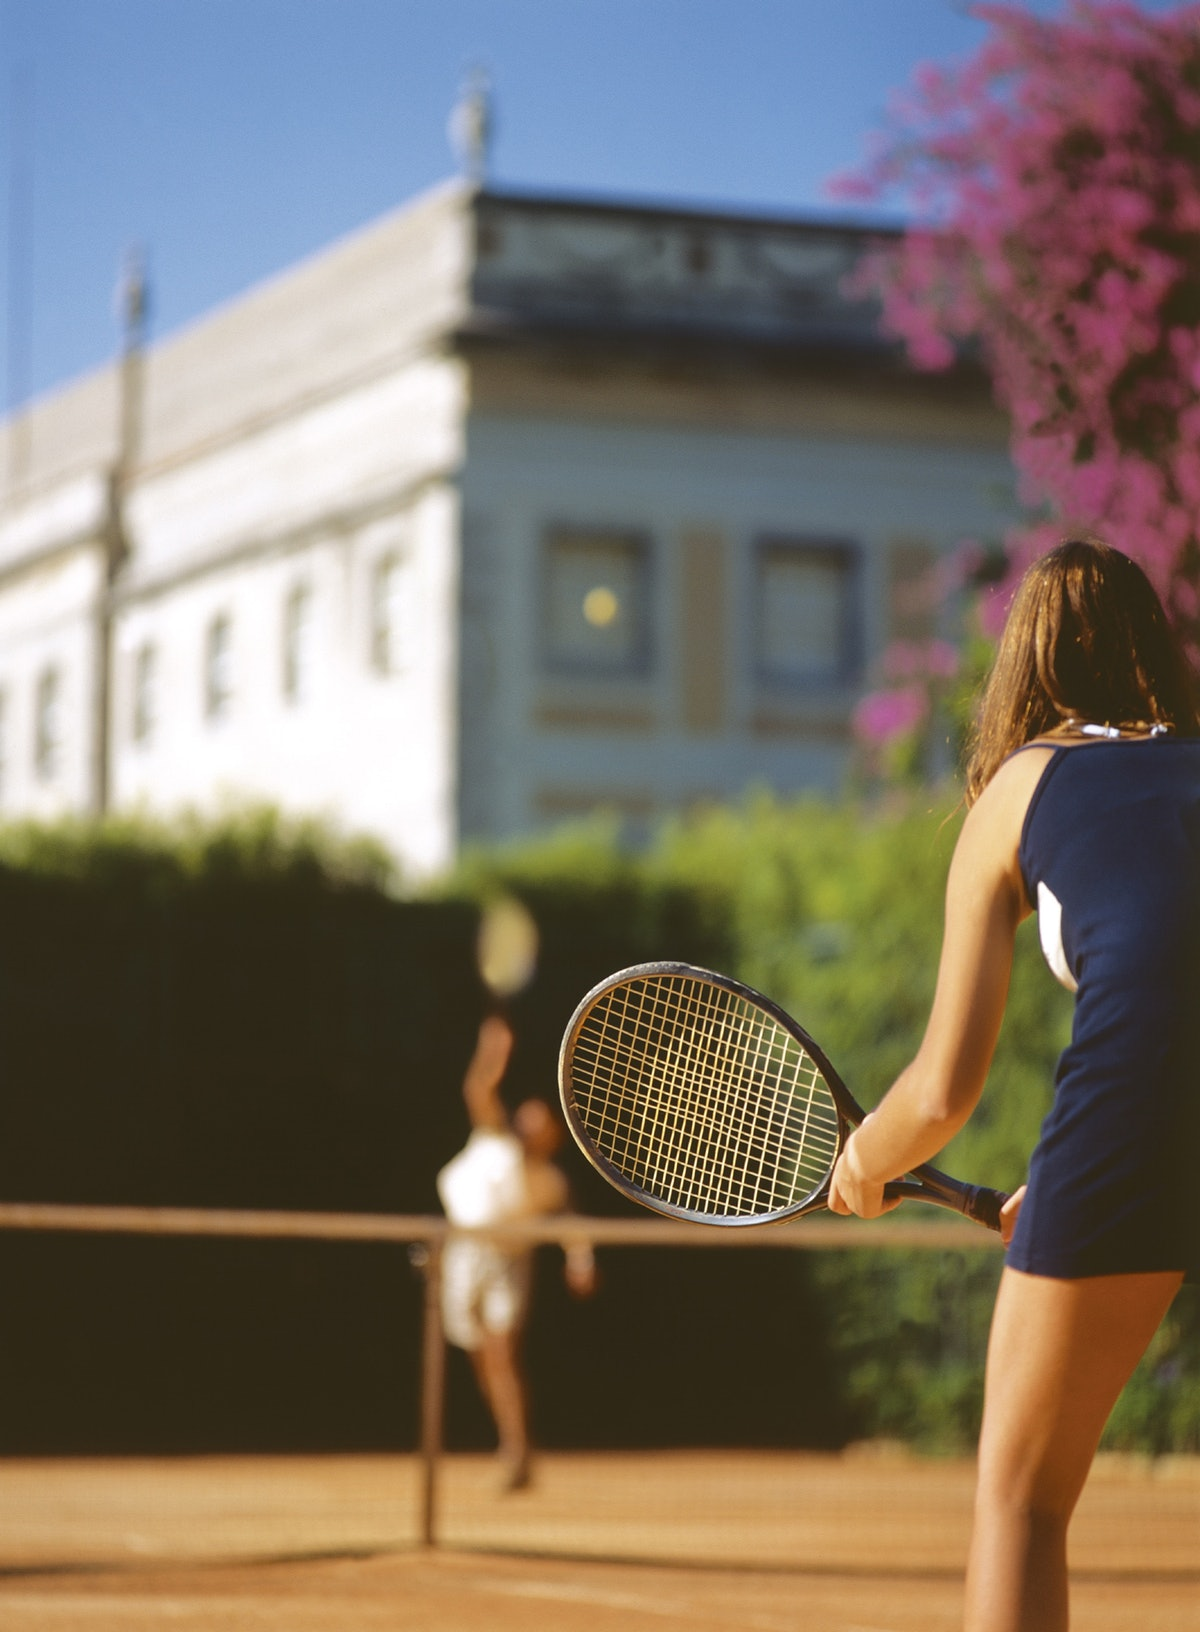 ivoli Palacio de Seiteis tennis